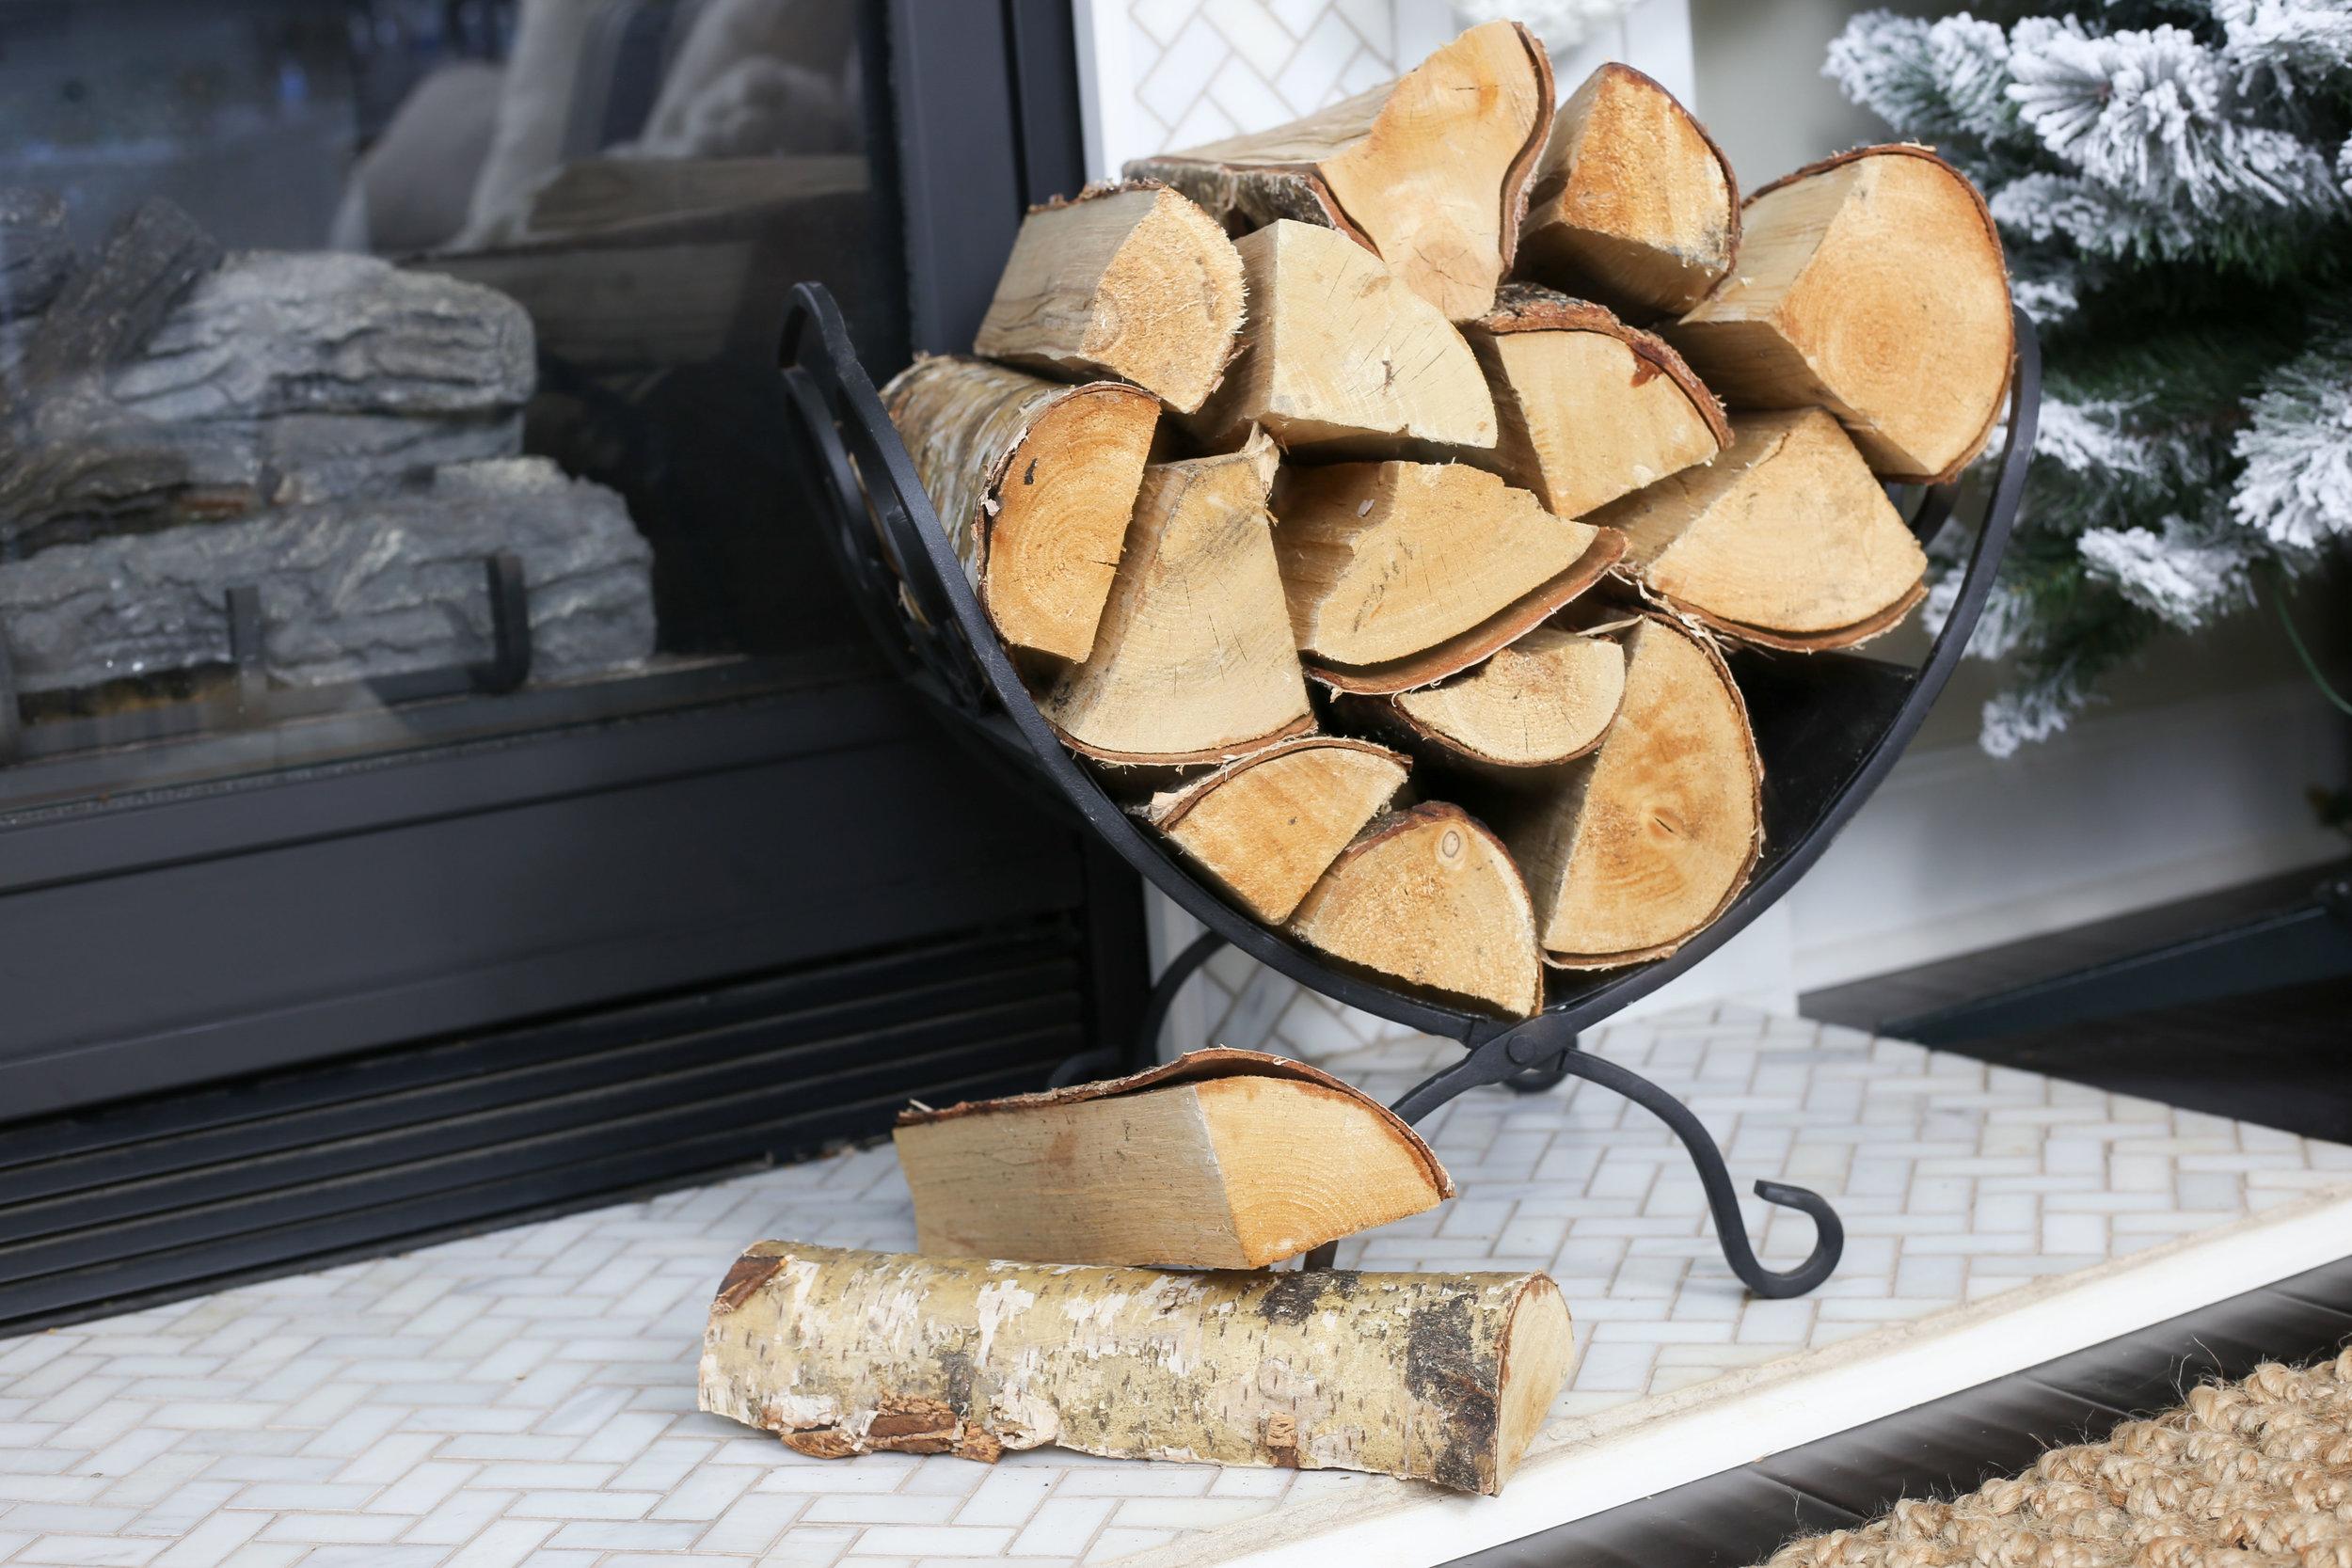 Christmas 2017 Home Tour: Deck The Blogs- Fireplace Decor with wood logs- Plum Pretty Decor & Design's Christmas Home Tour